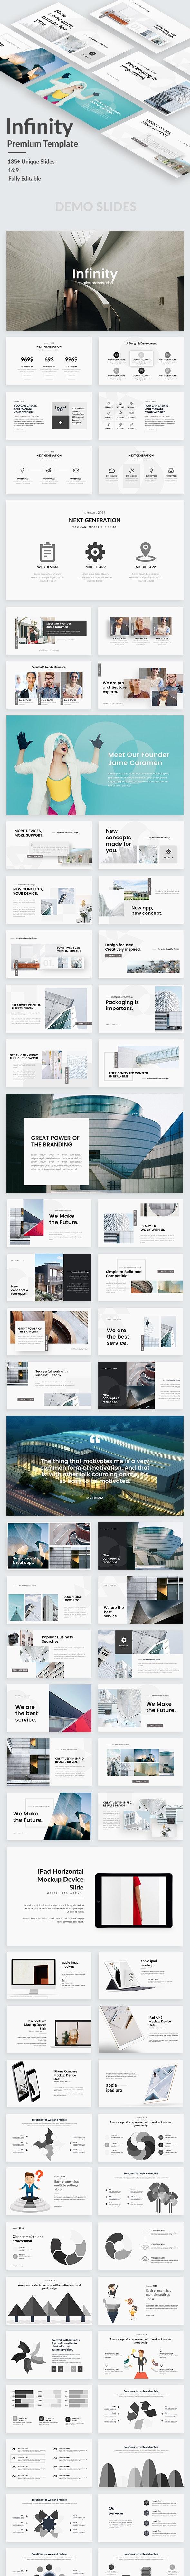 Infinity Creative Powerpoint Template - Creative PowerPoint Templates